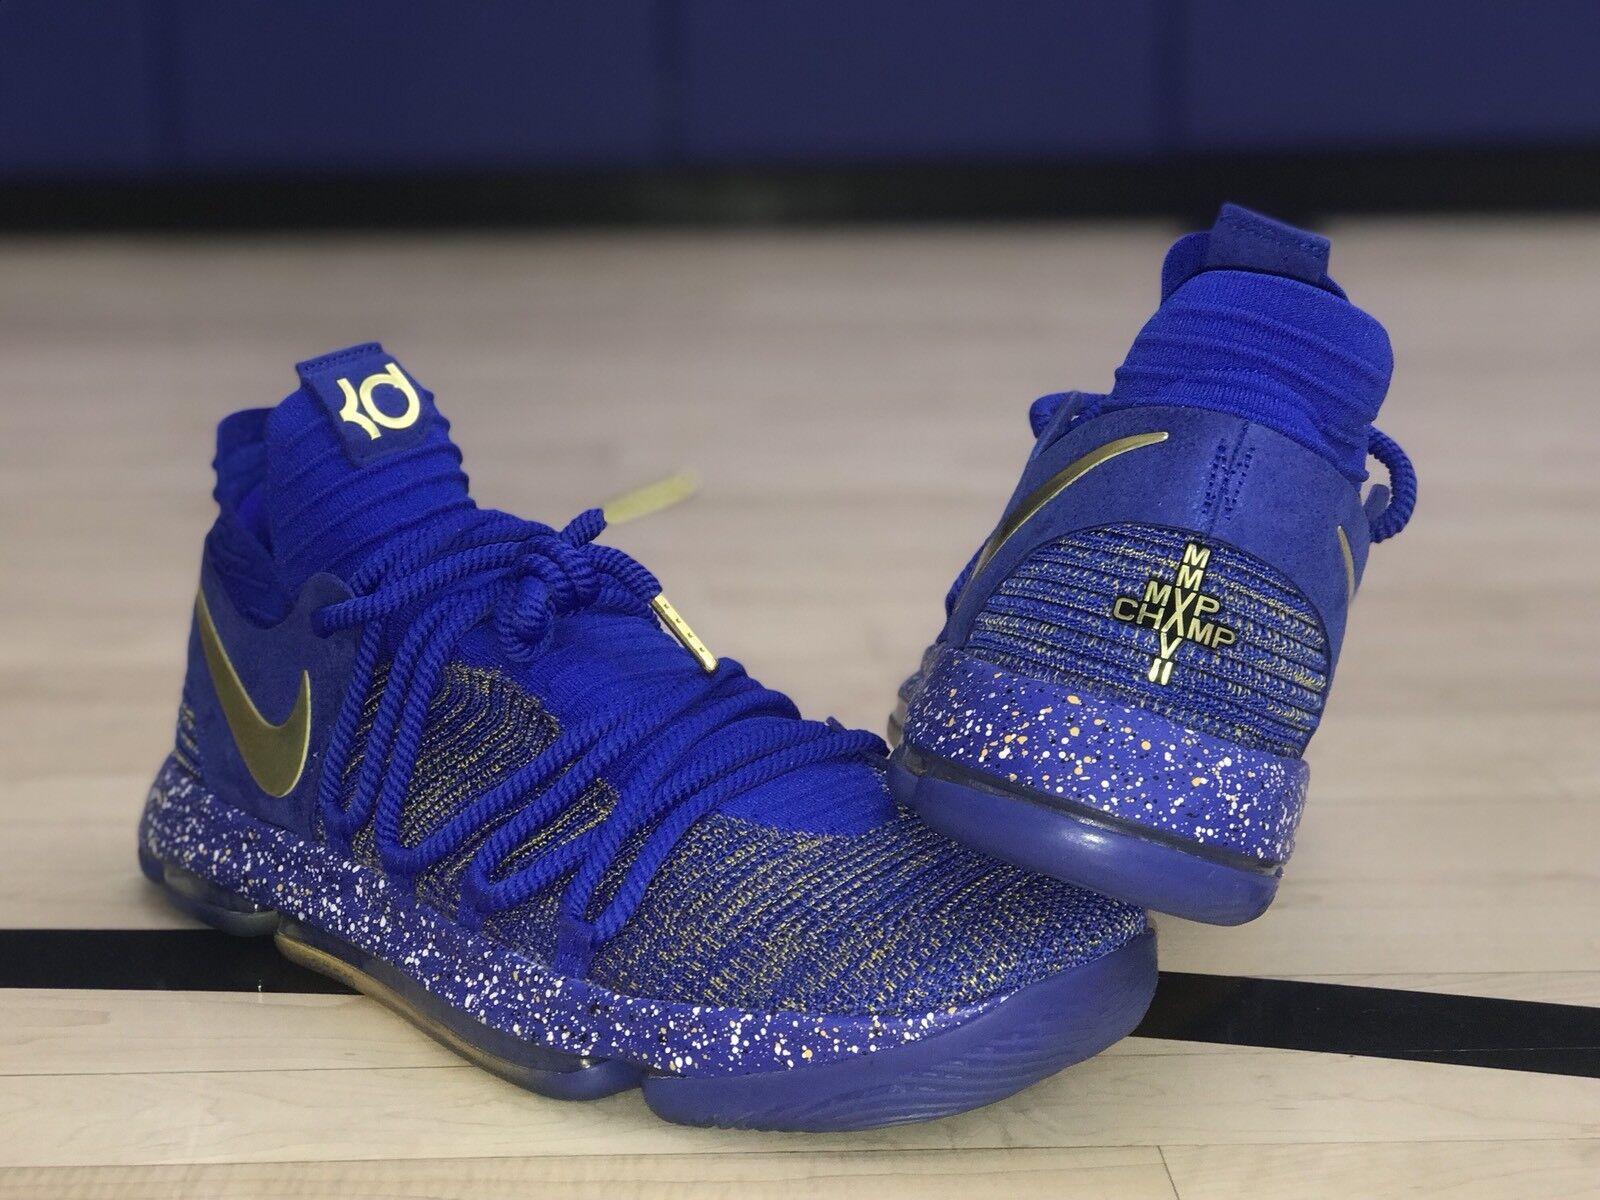 Nike Zoom KD X 10 Finals MVP PE 897815-403 Durant GSW QS PE SIZE 16